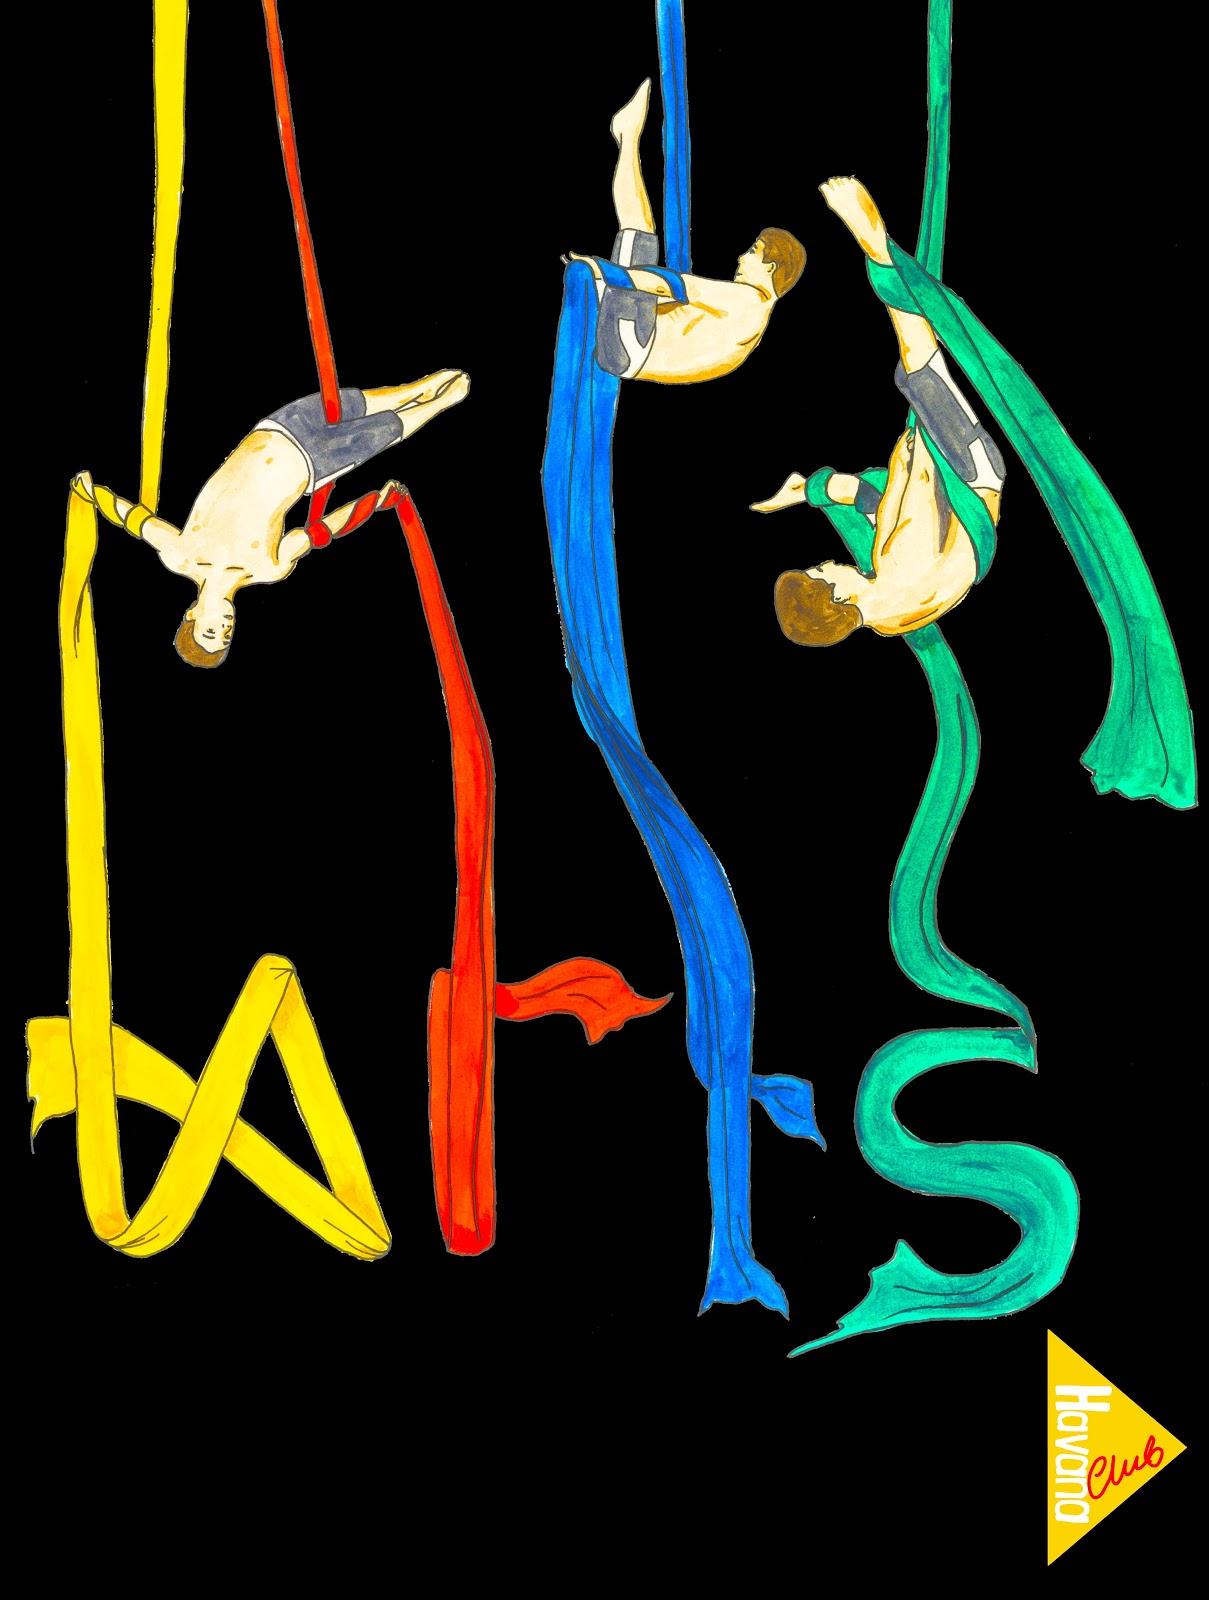 art festival logos   viewing gallery